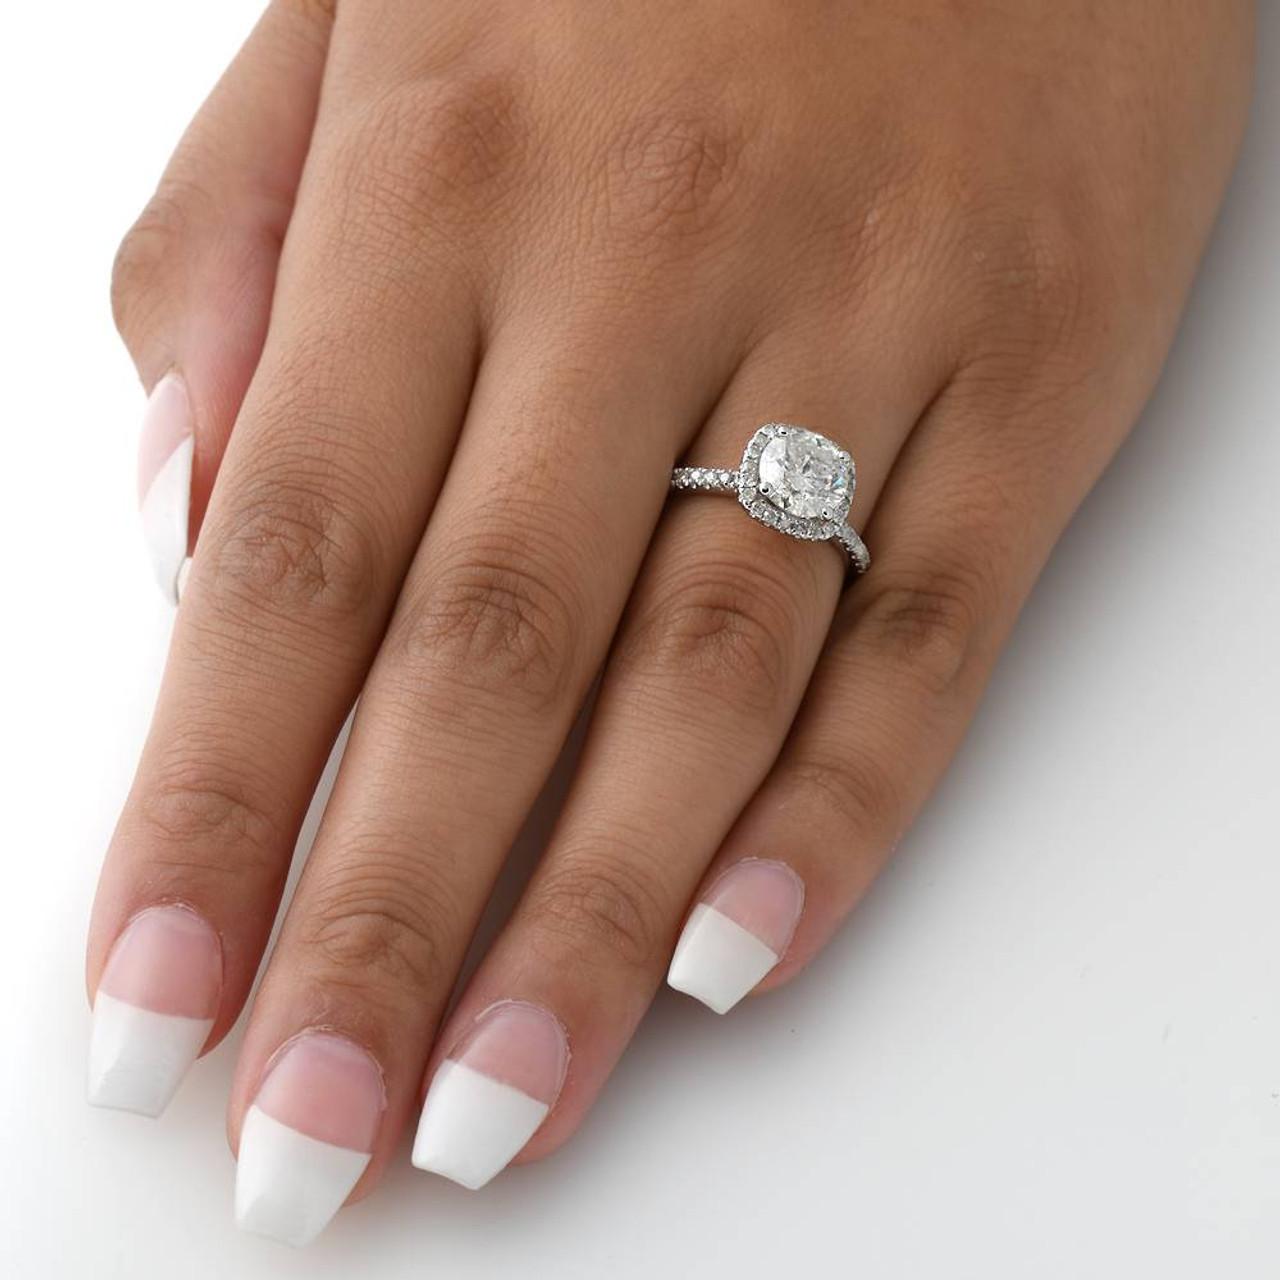 2 Carat Cushion Halo Diamond Engagement Ring 14k White Gold G H Si 1 Si 2